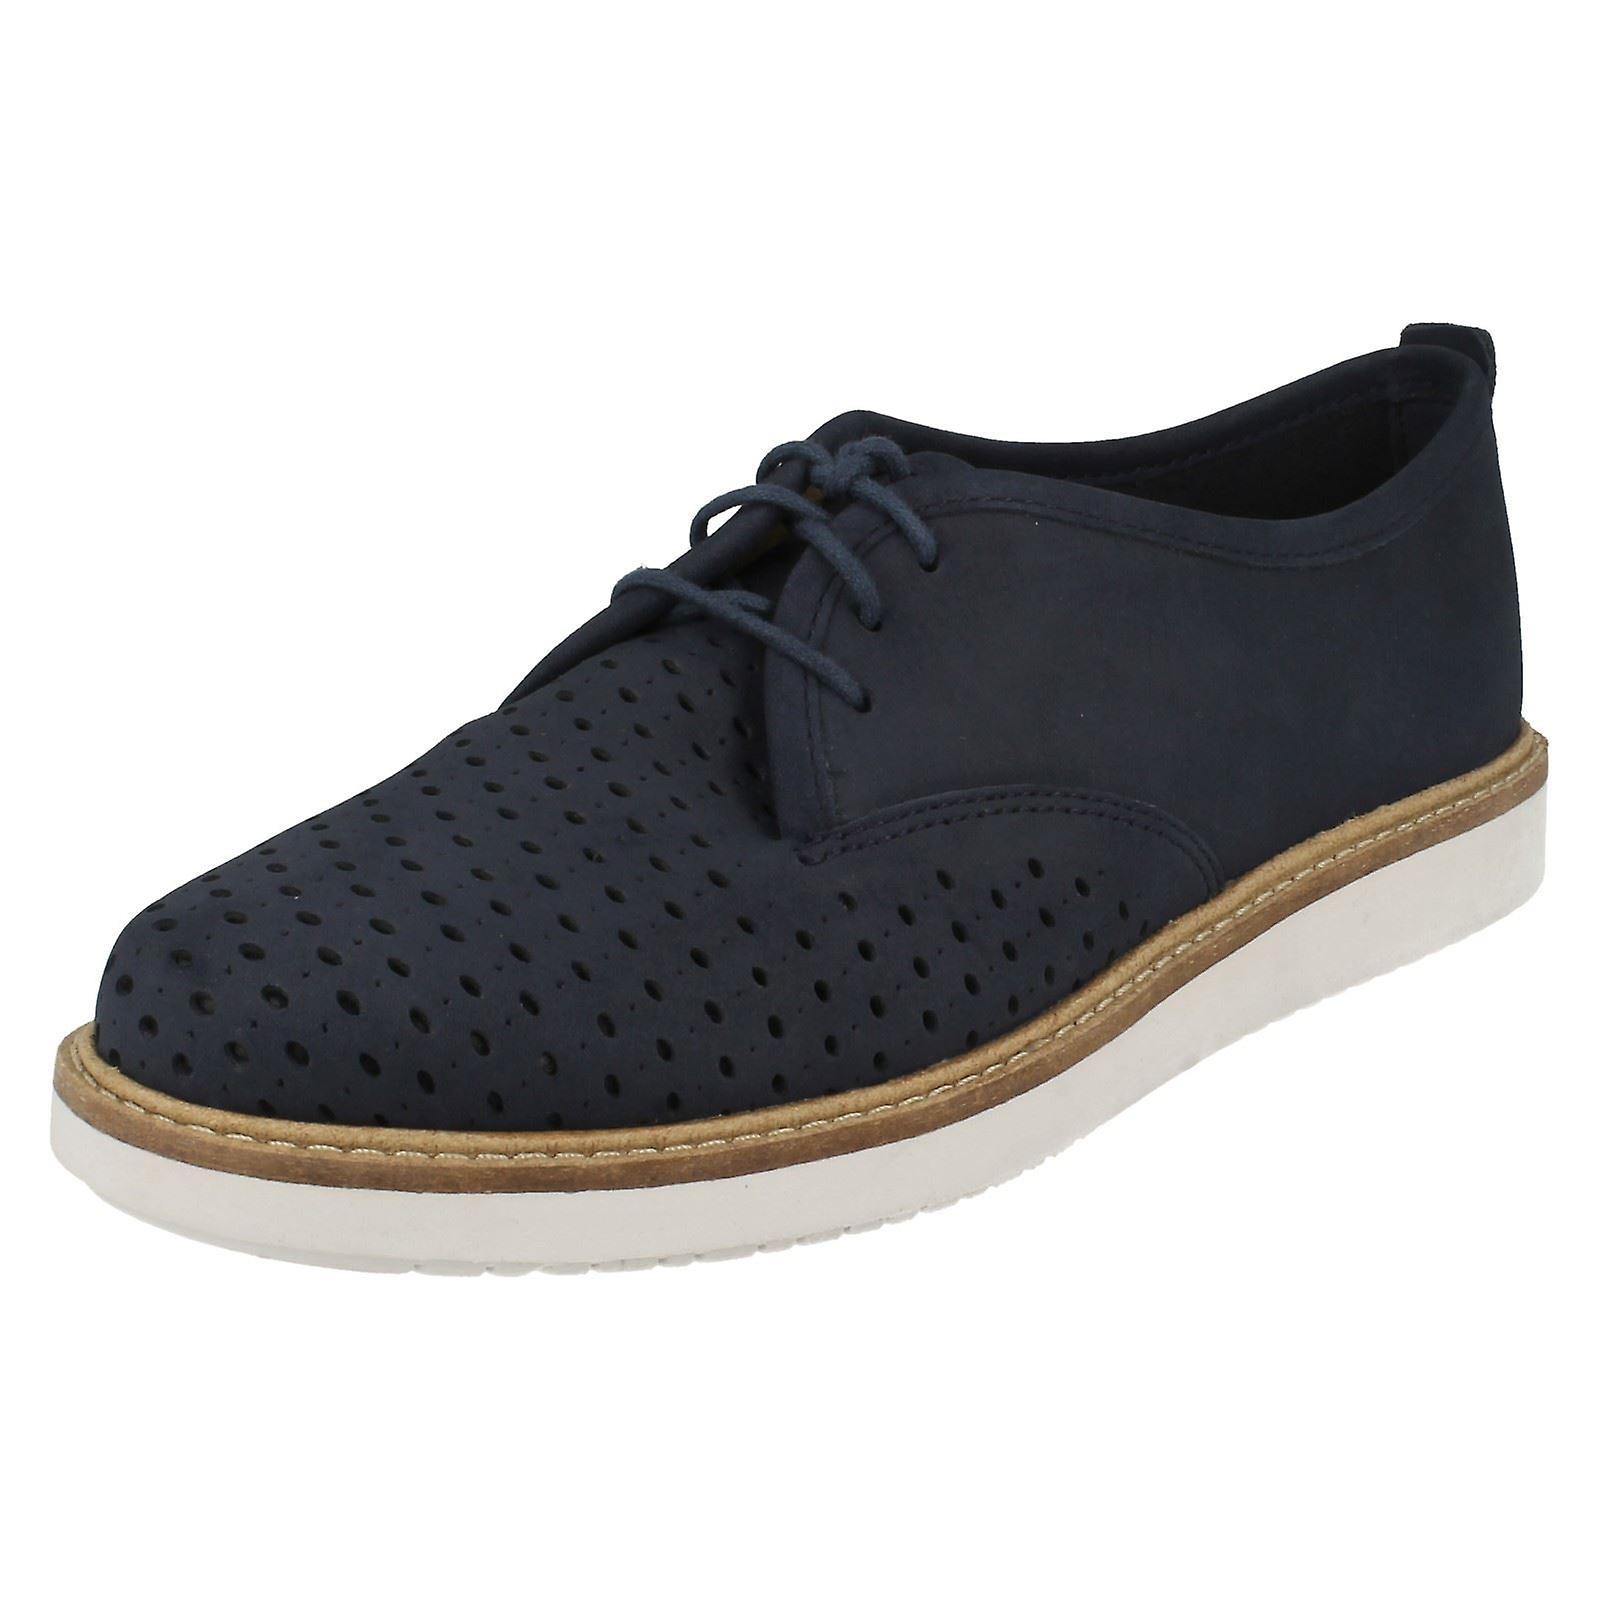 Ladies Clarks load/Men's/Women's Casual Shoes Glick Resseta/famous load/Men's/Women's Clarks 711bfb